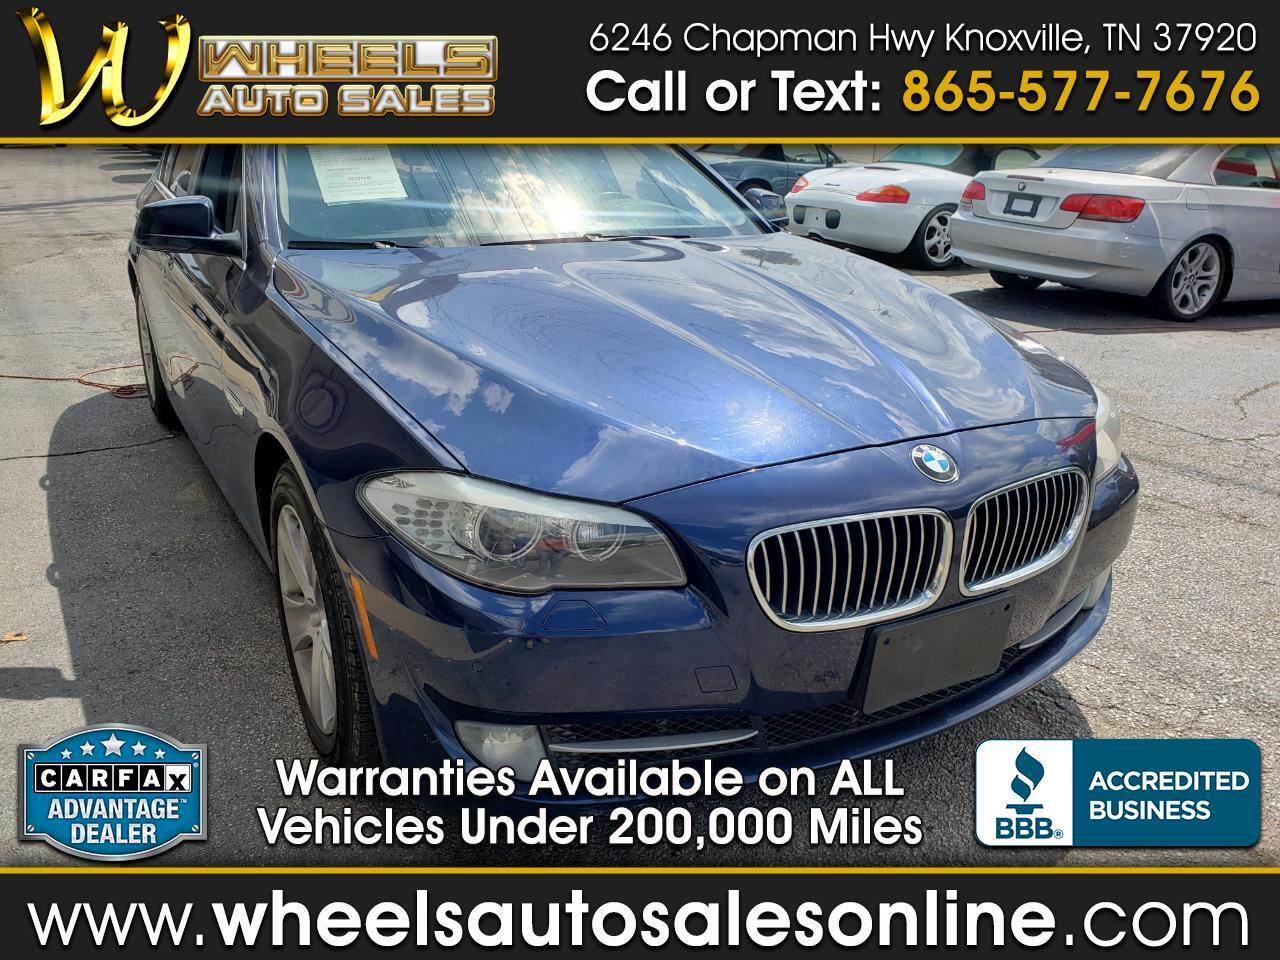 2013 BMW 5 Series 4dr Sdn 528i RWD